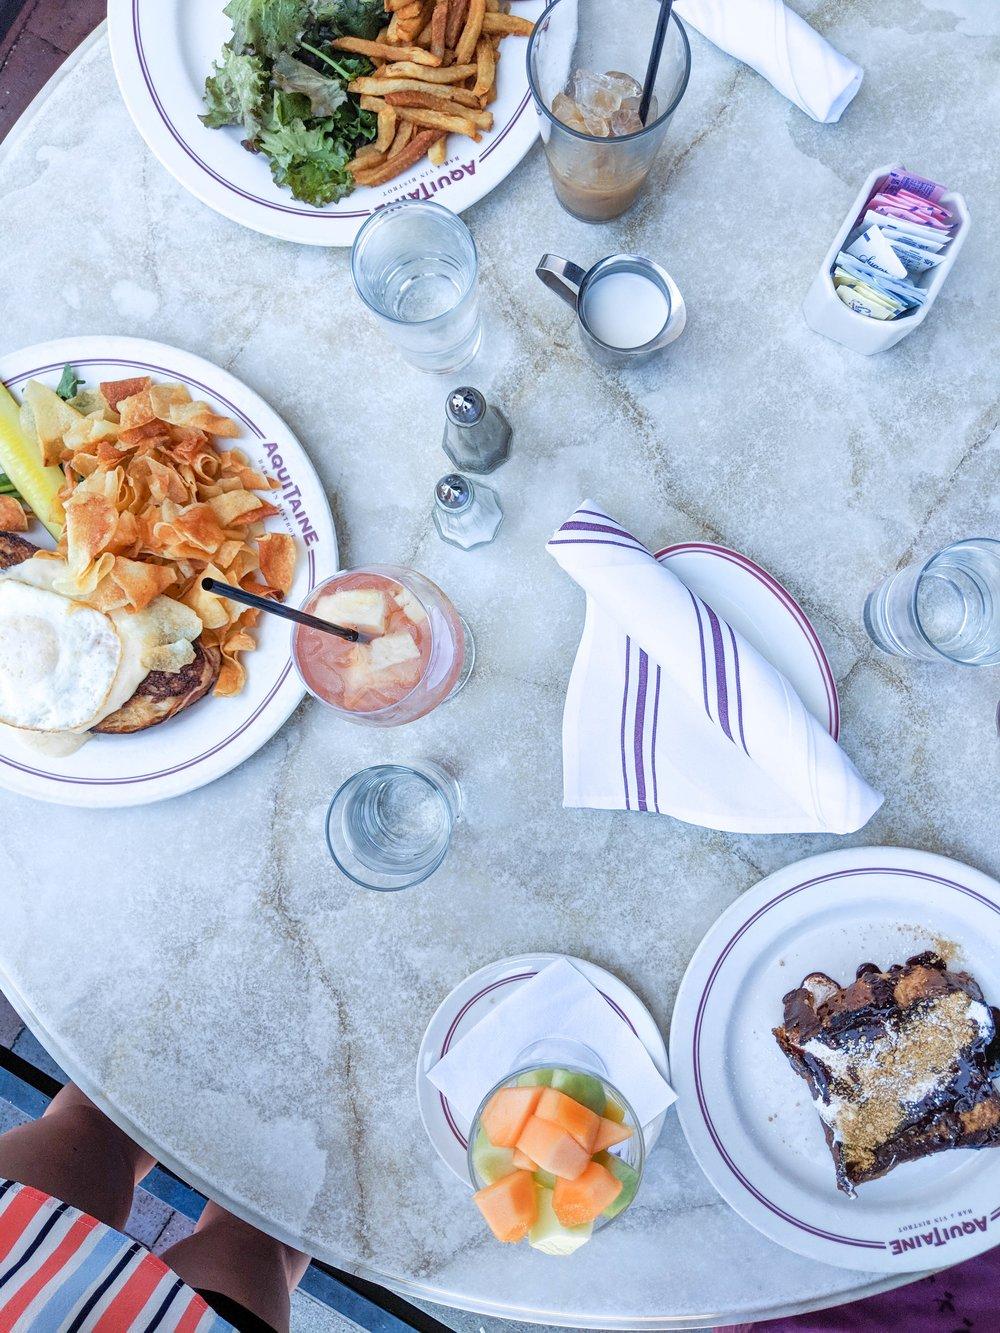 bri rinehart; photography; food